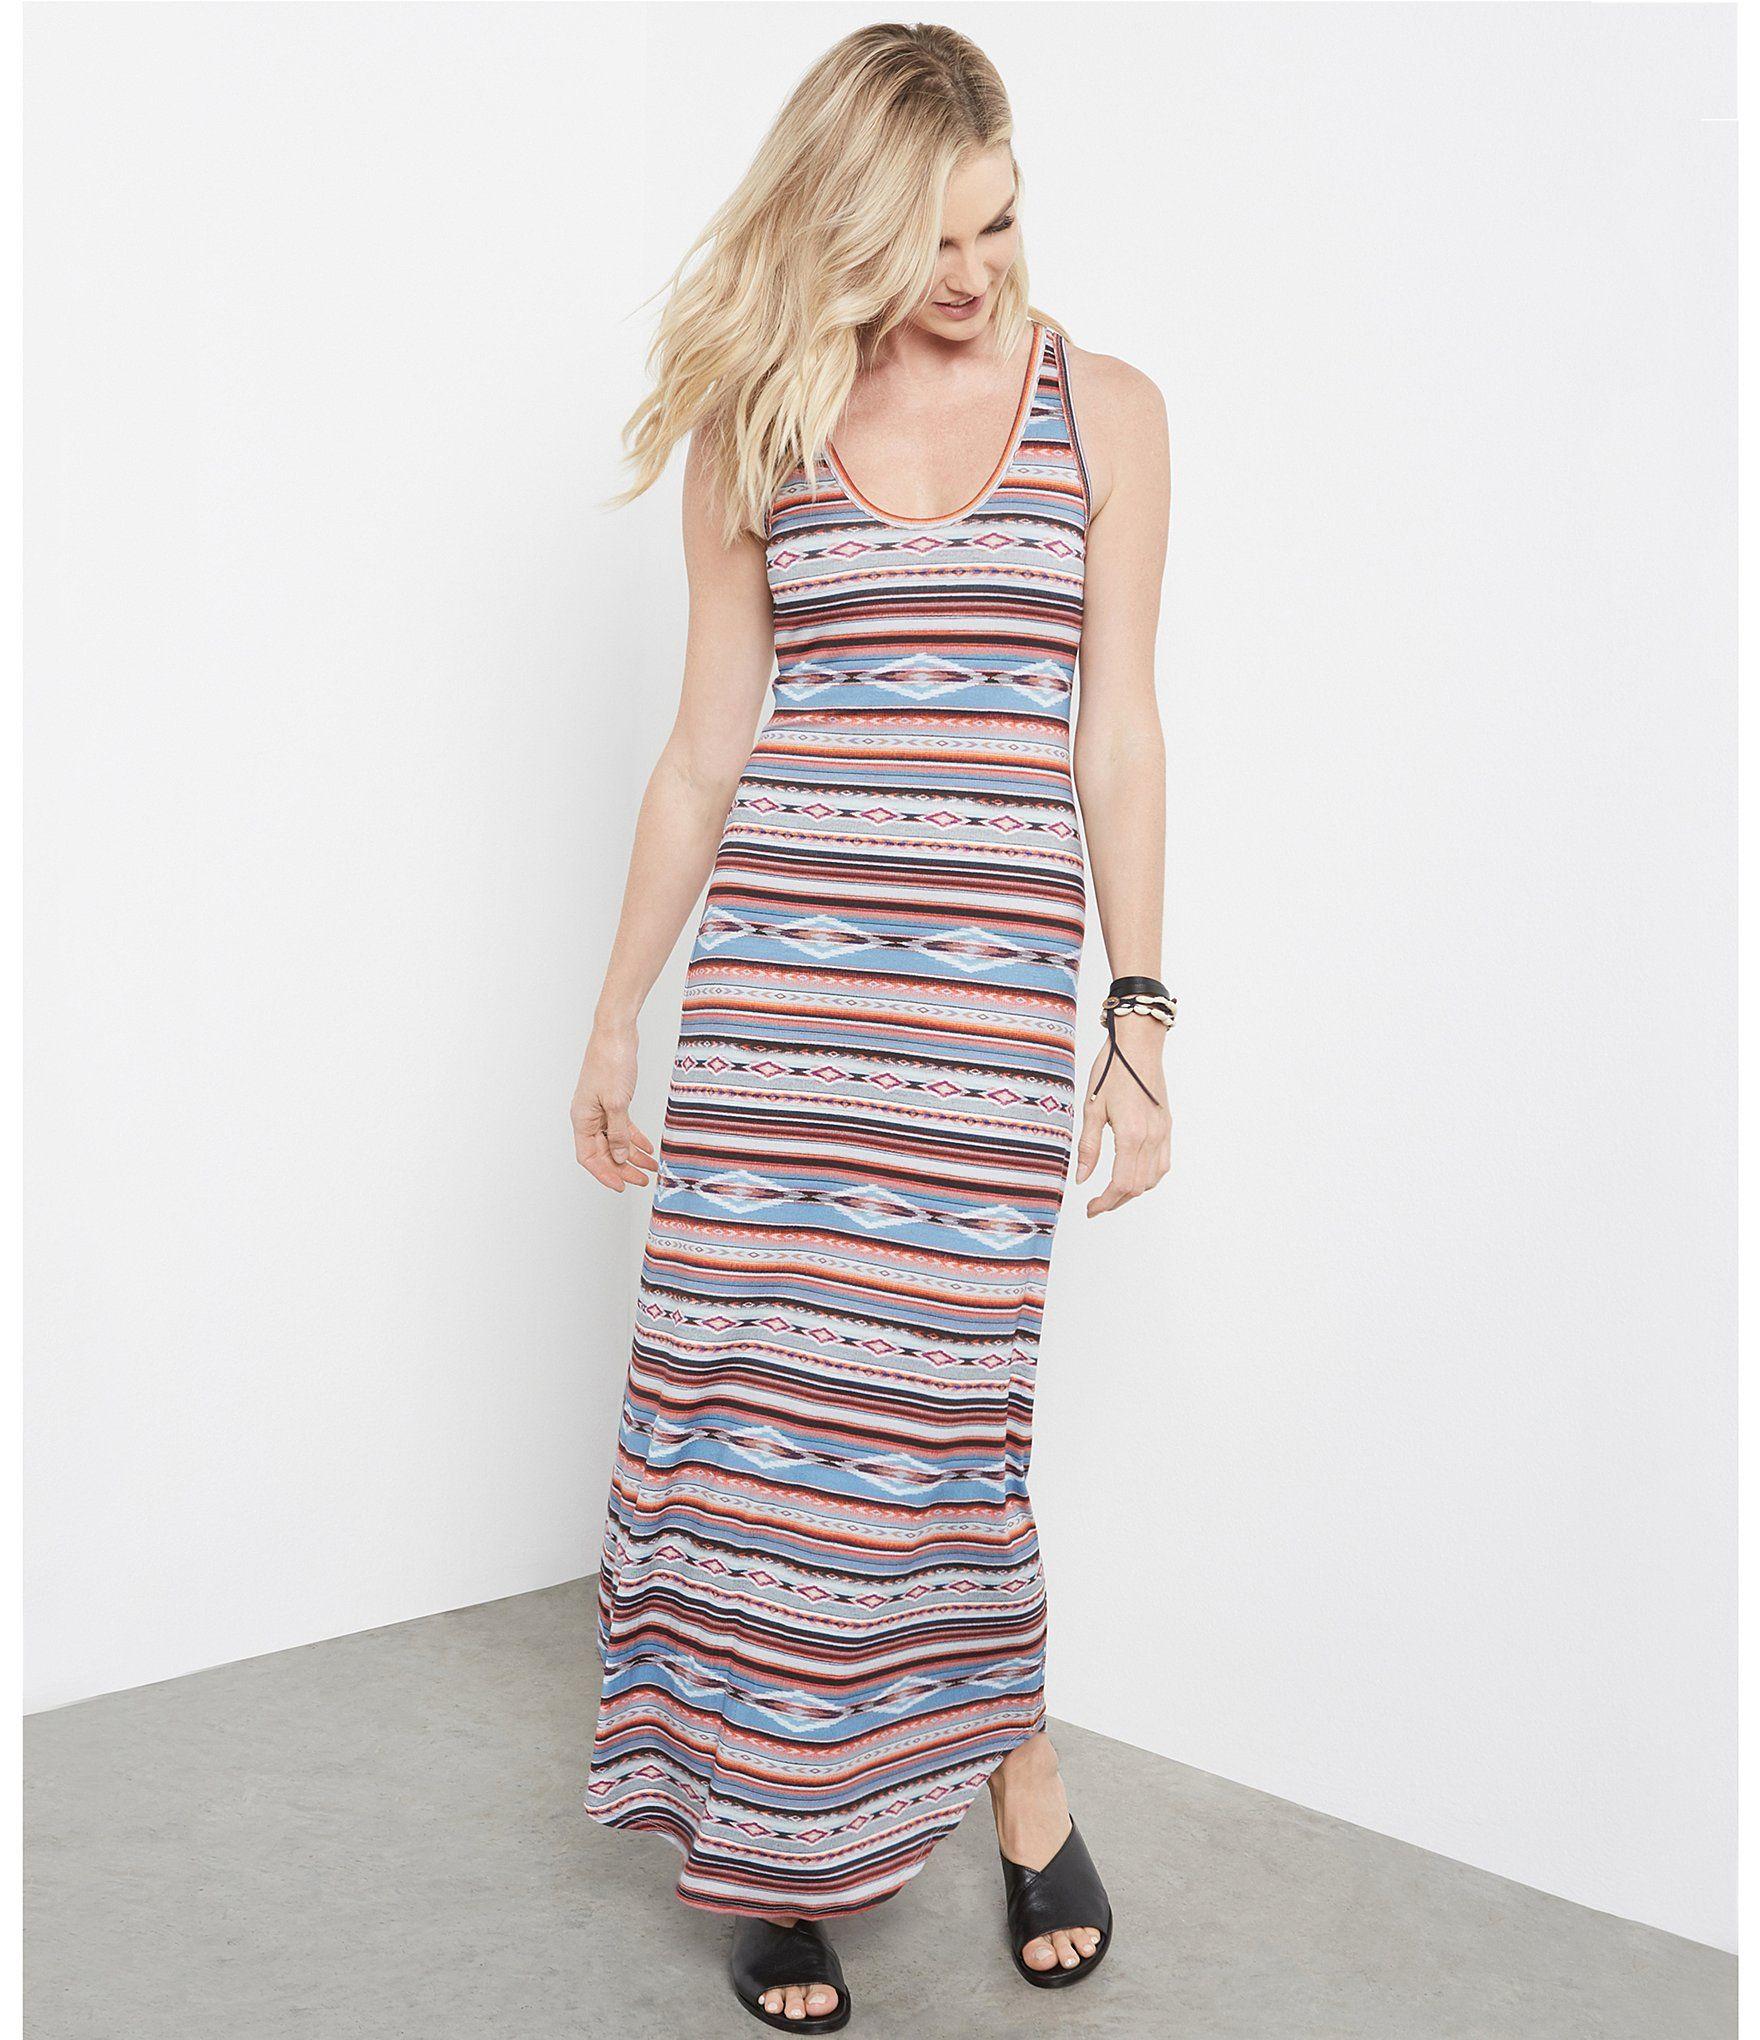 Karen Kane Stretch Knit Multi Stripe Printed Maxi Dress Dillards Maxi Dress Printed Maxi Dress Flowing Maxi Dress [ 2040 x 1760 Pixel ]